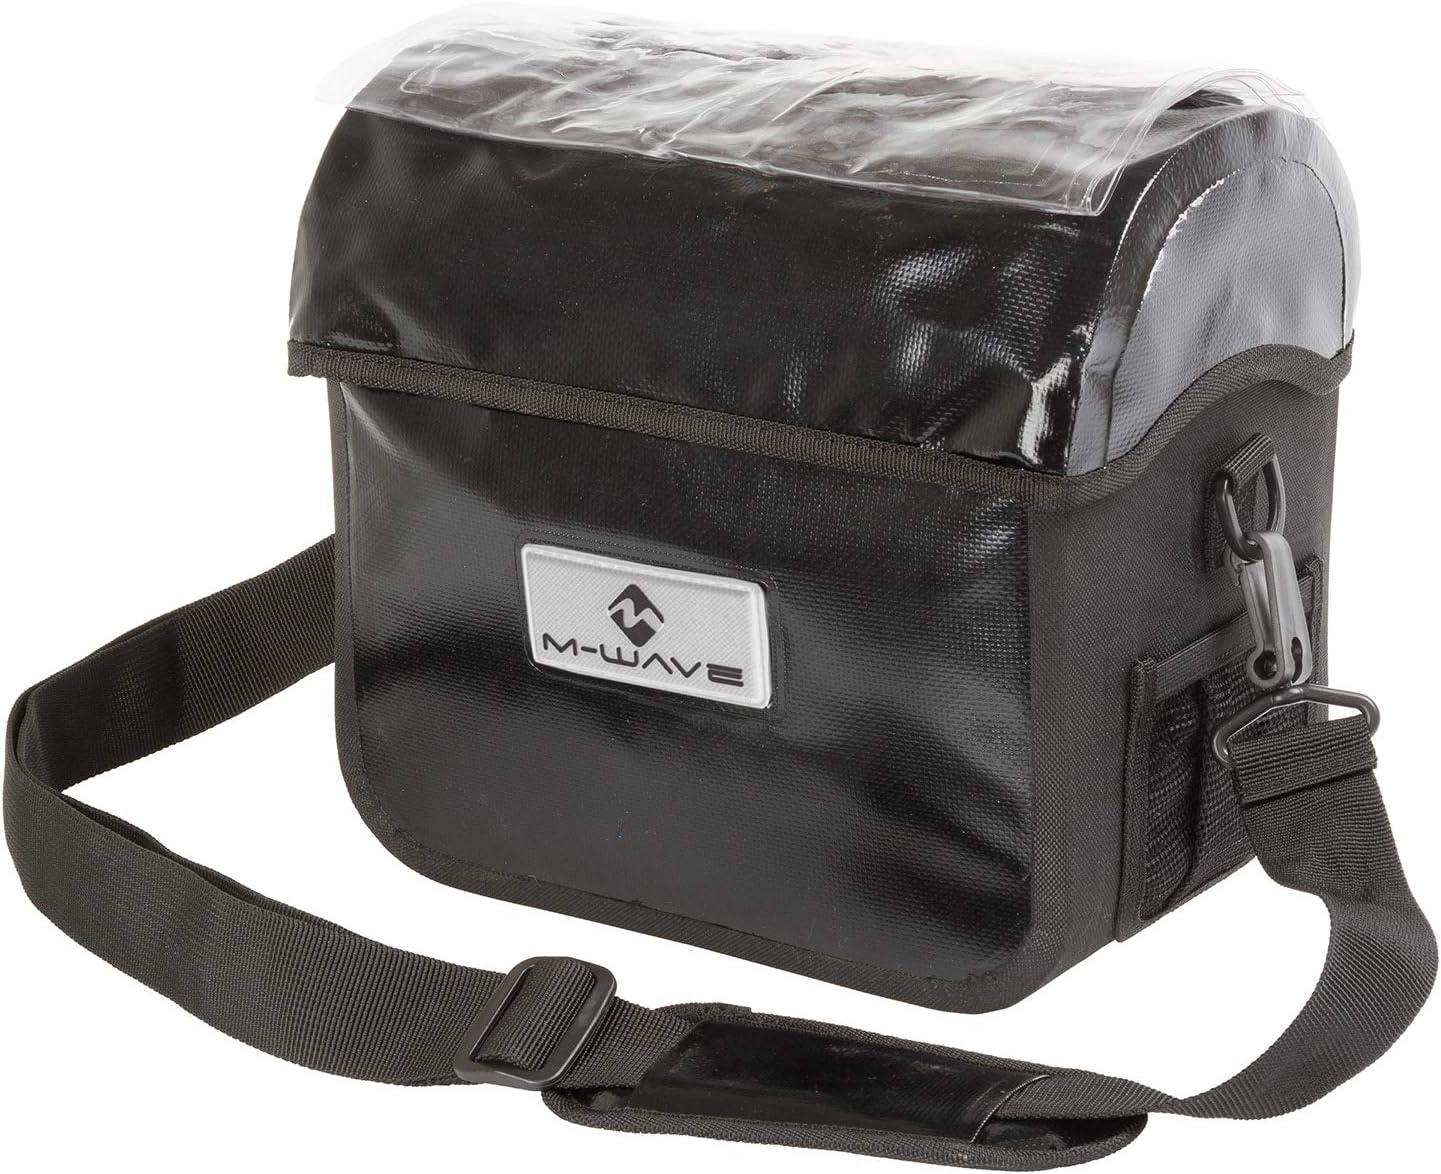 M-Wave Ottawa Limited price Sale item sale Clip-on Handlebar Bag